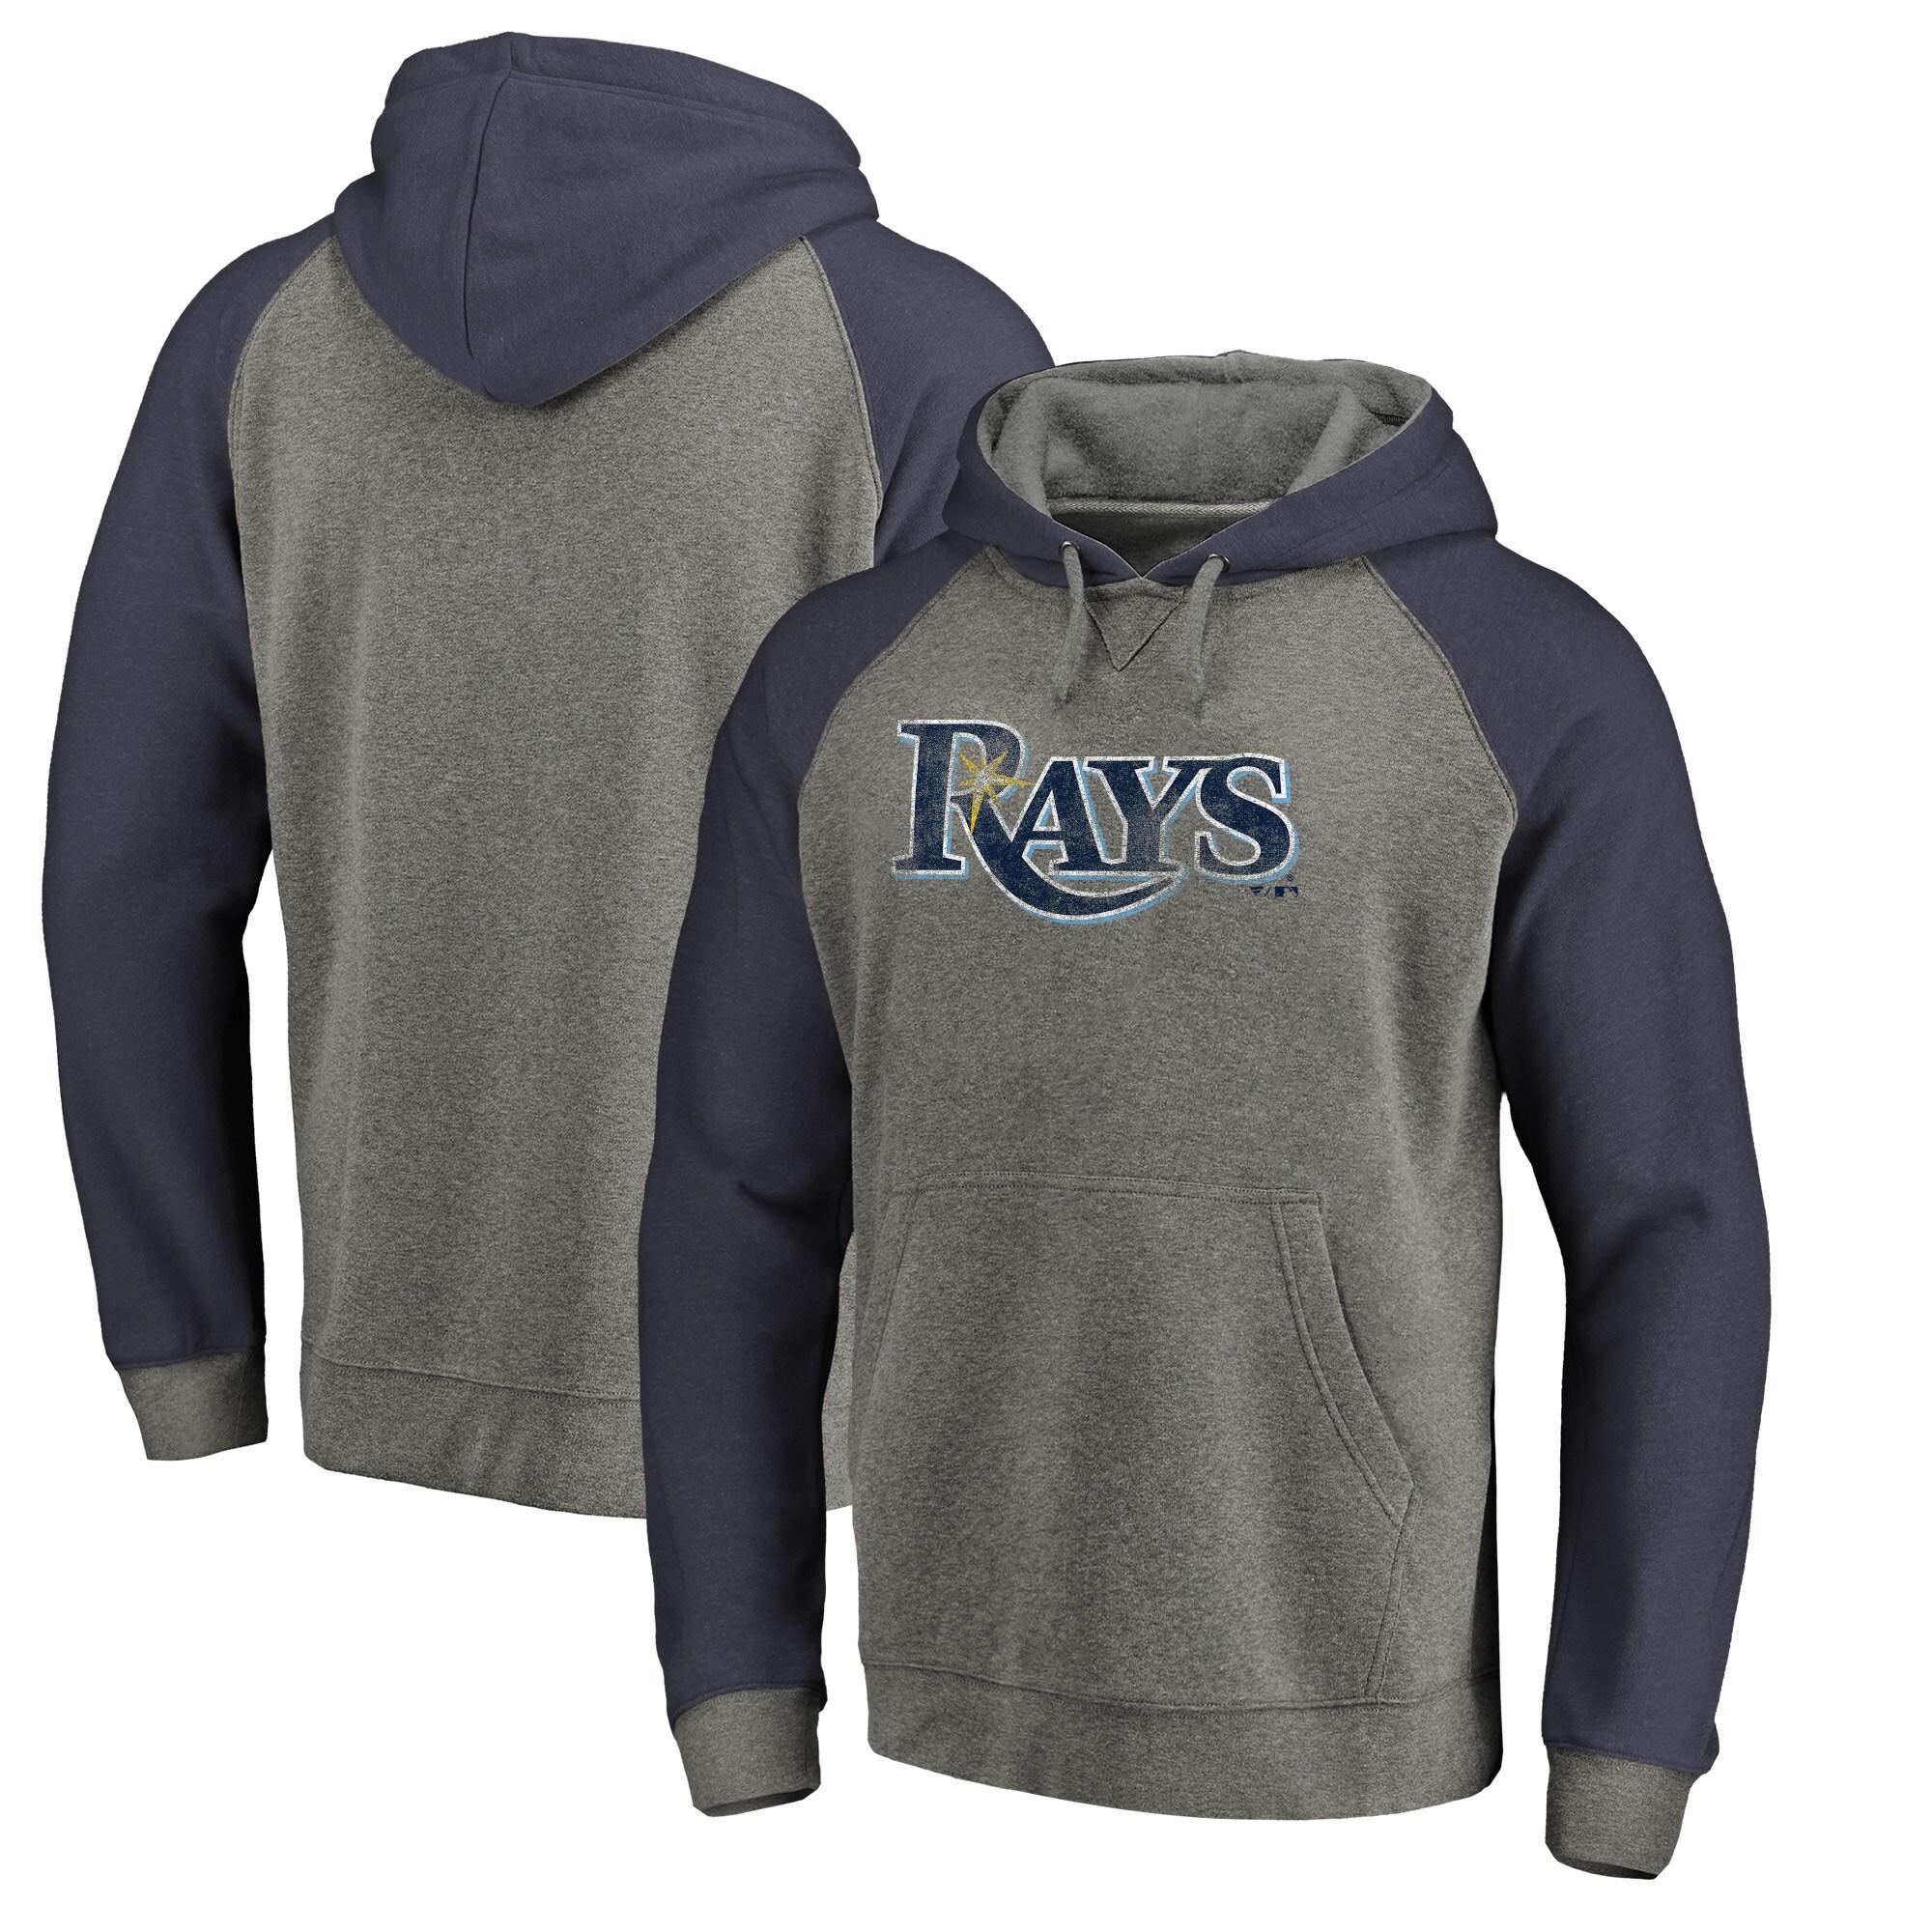 Tampa Bay Rays Fanatics Branded Distressed Team Logo Tri-Blend Raglan Pullover Hoodie - Gray/Navy